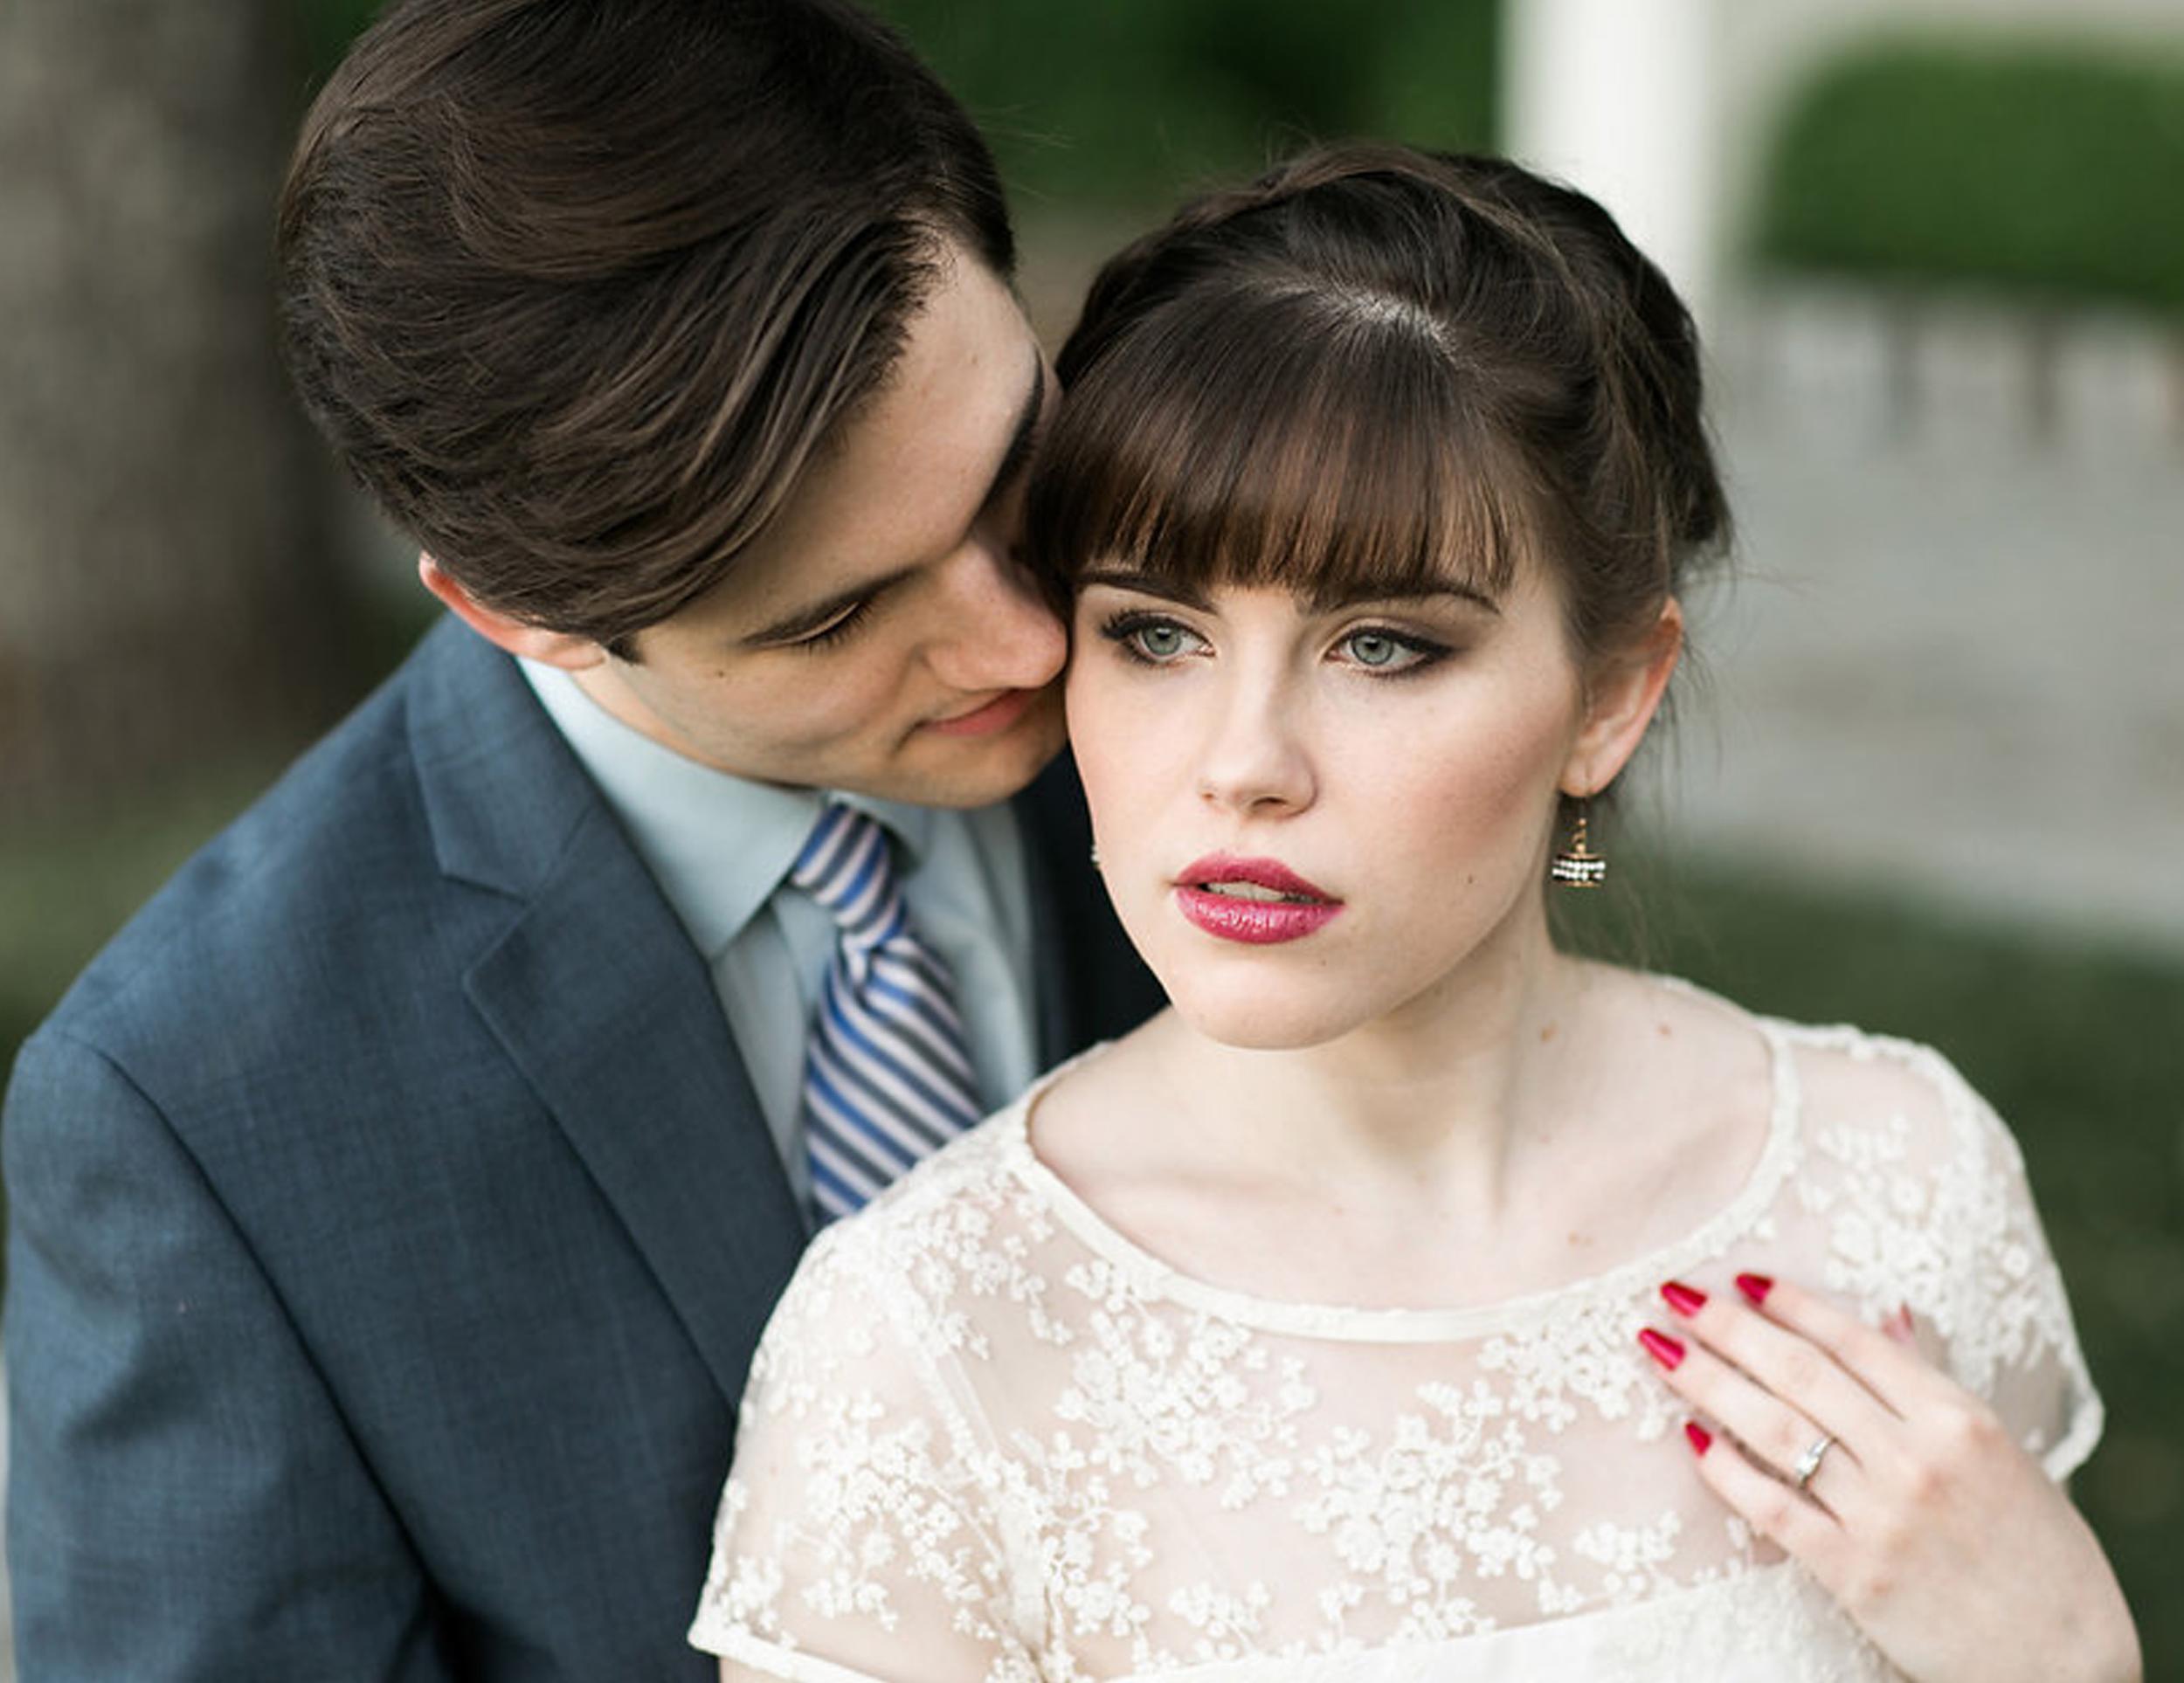 Bride_6.png